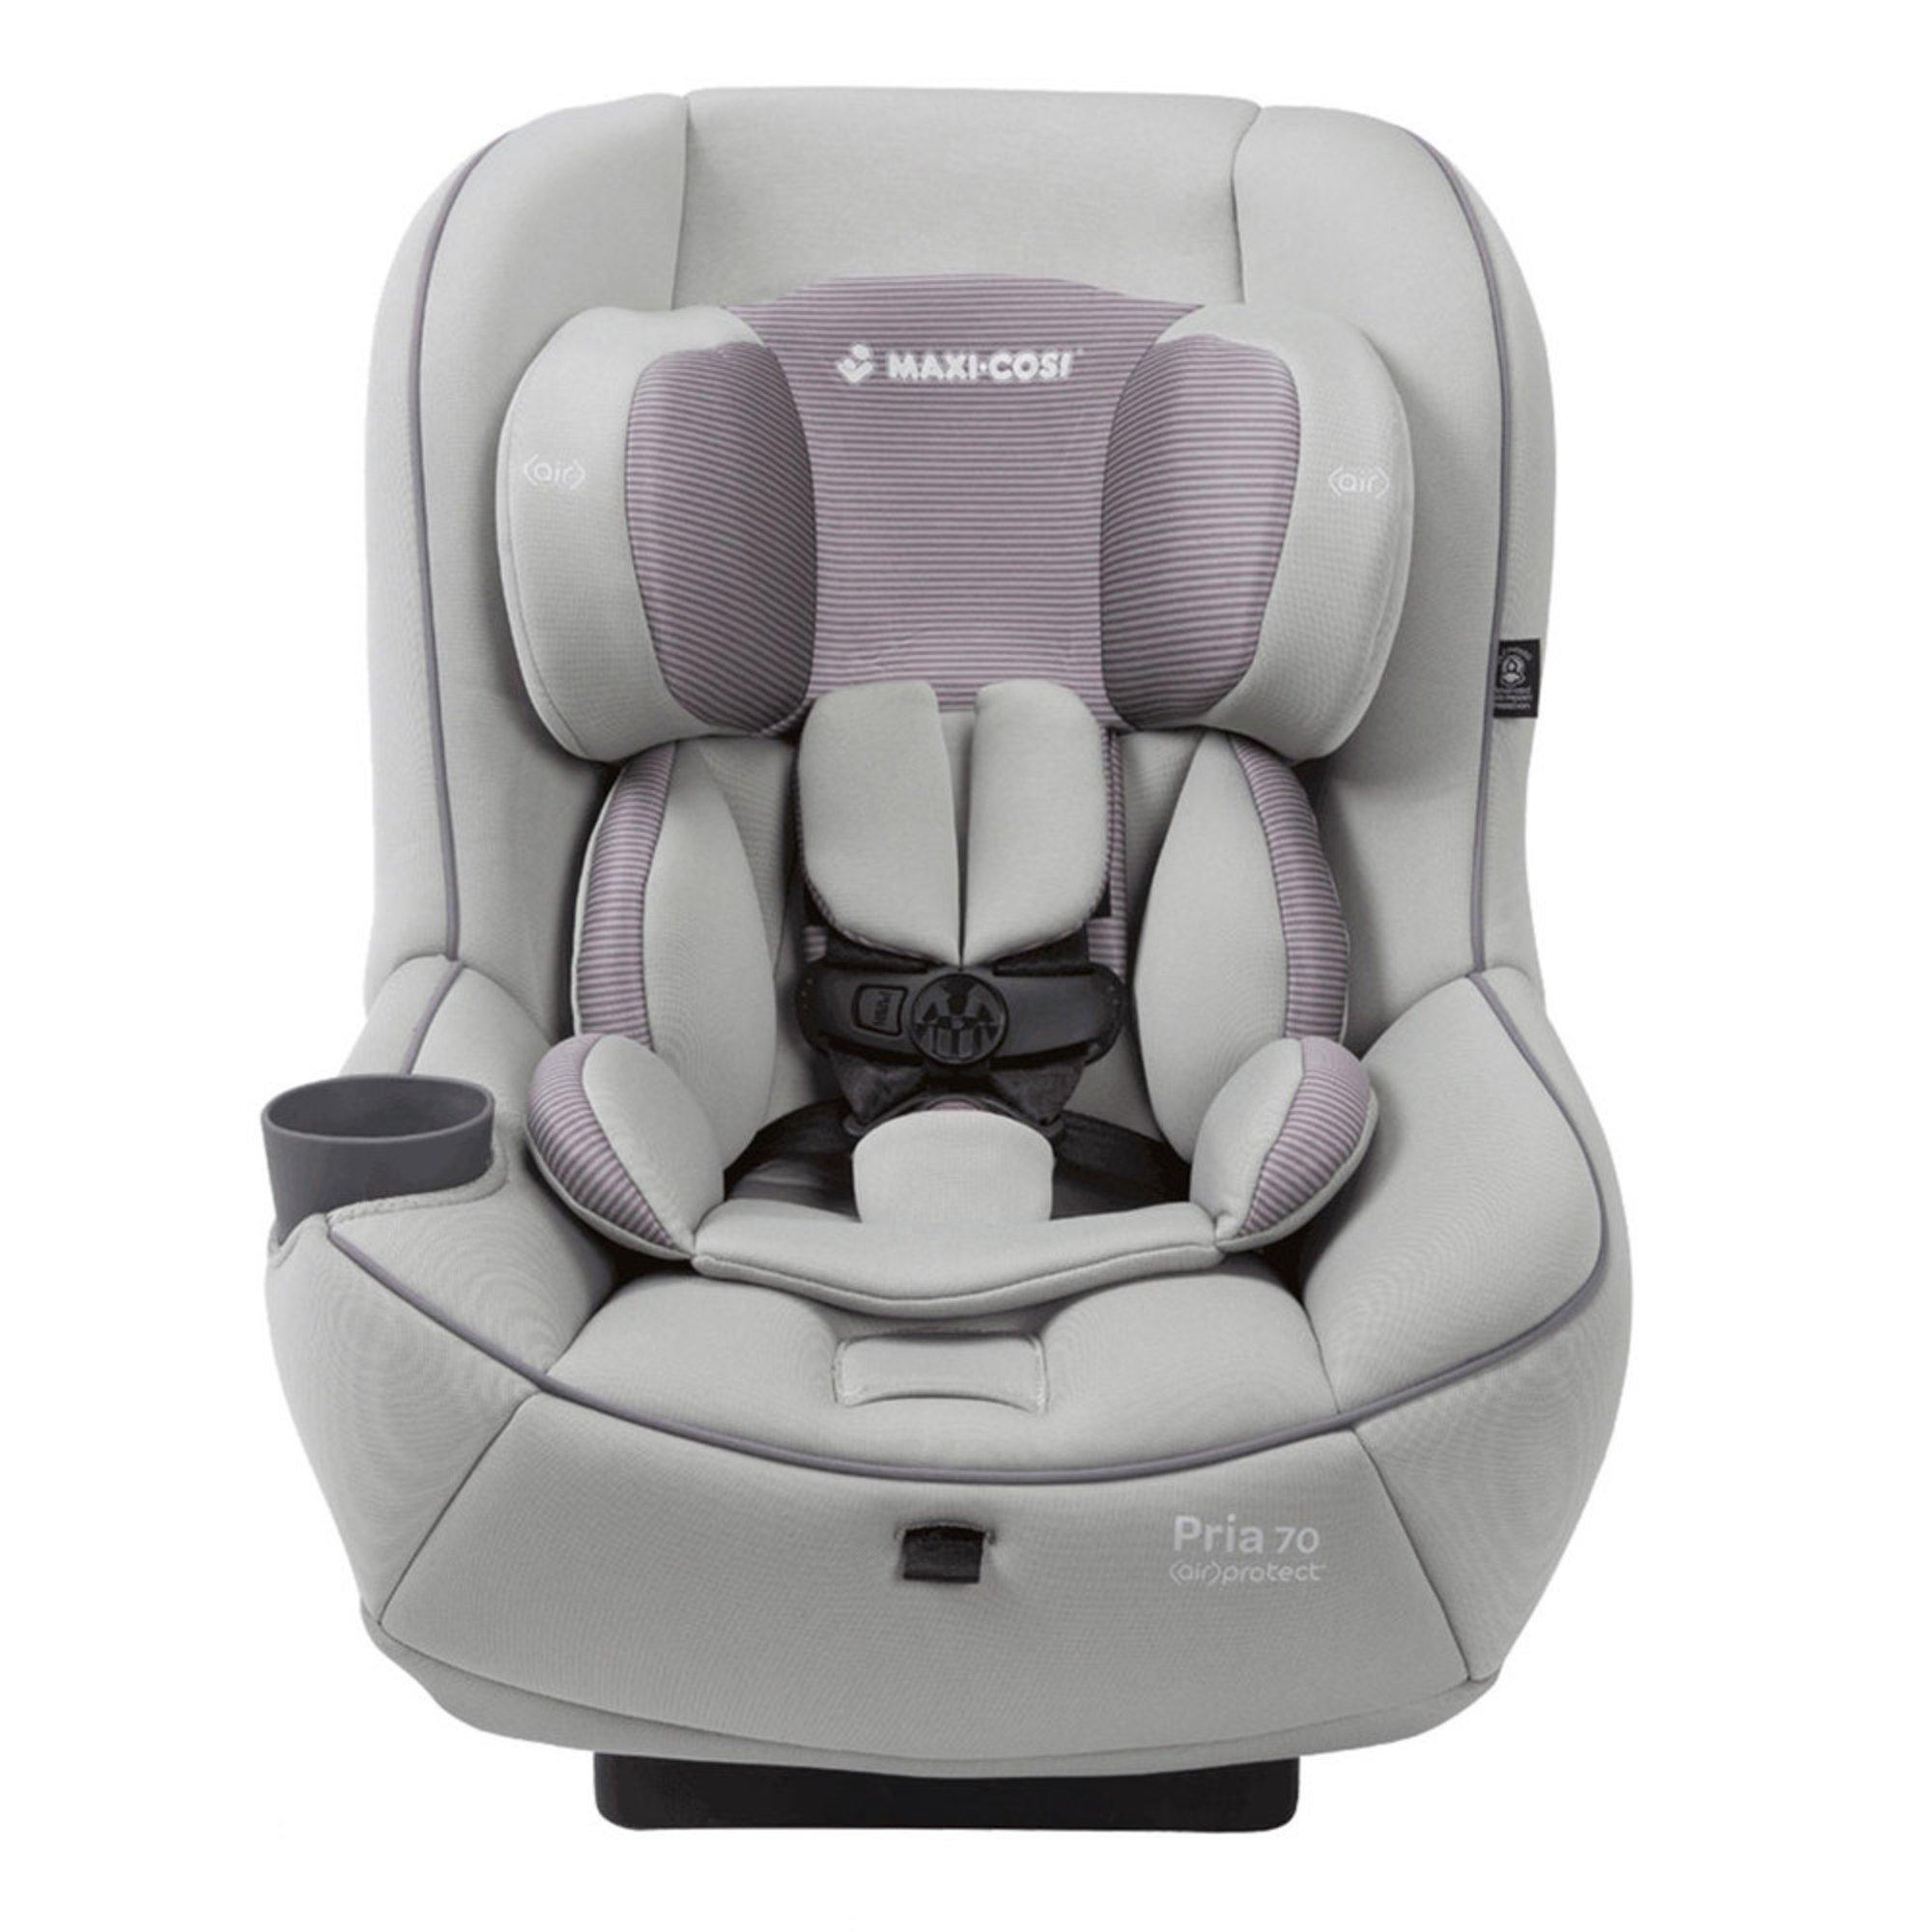 Maxi Cosi Pria 70 Convertible Car Seat